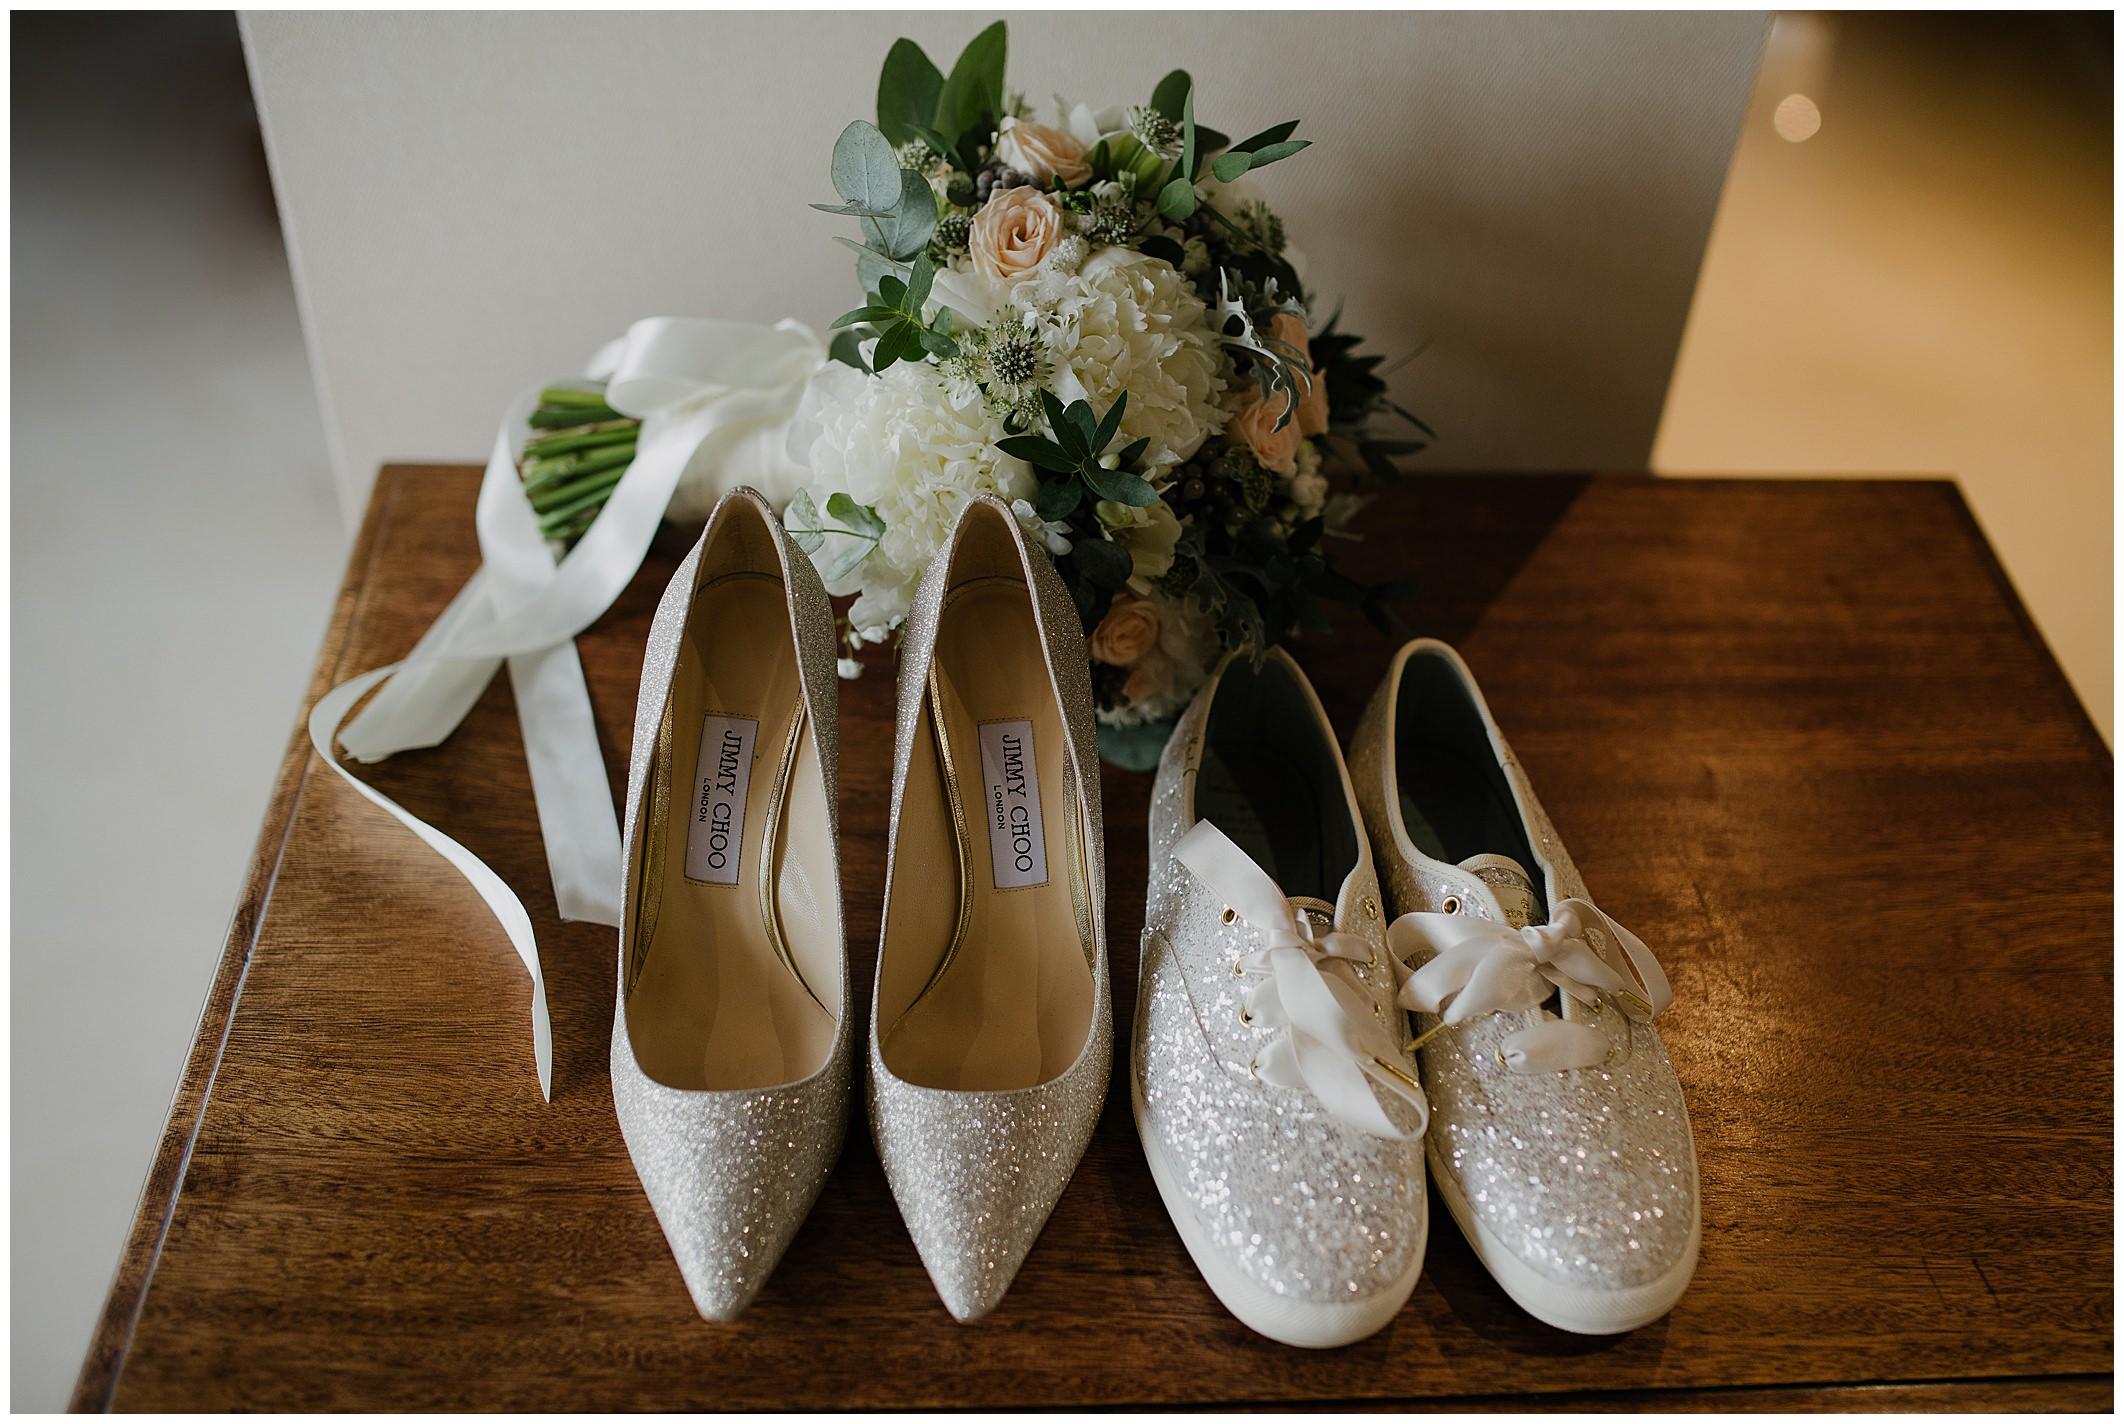 farnham-estate-wedding-jude-browne-photography_0002.jpg